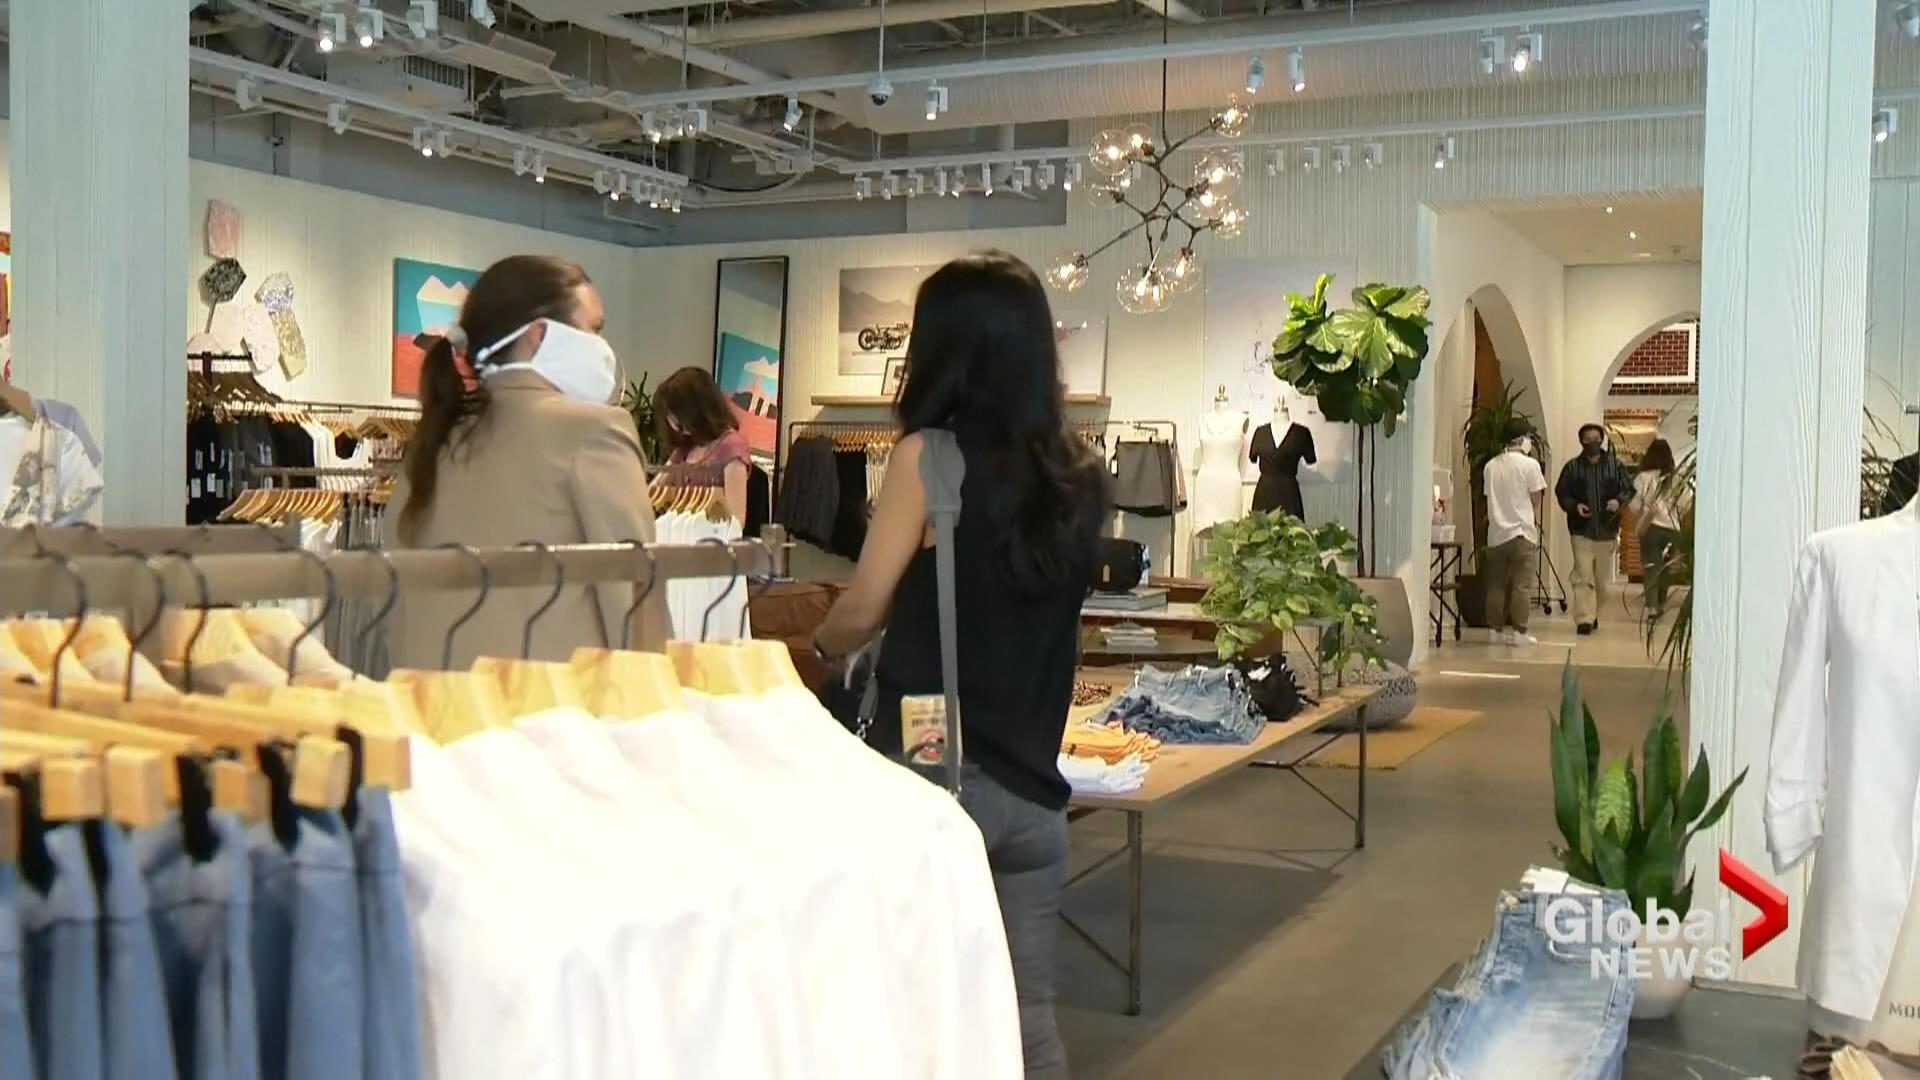 Phase 2 Of Saskatchewan S Reopening Plan Begins Watch News Videos Online